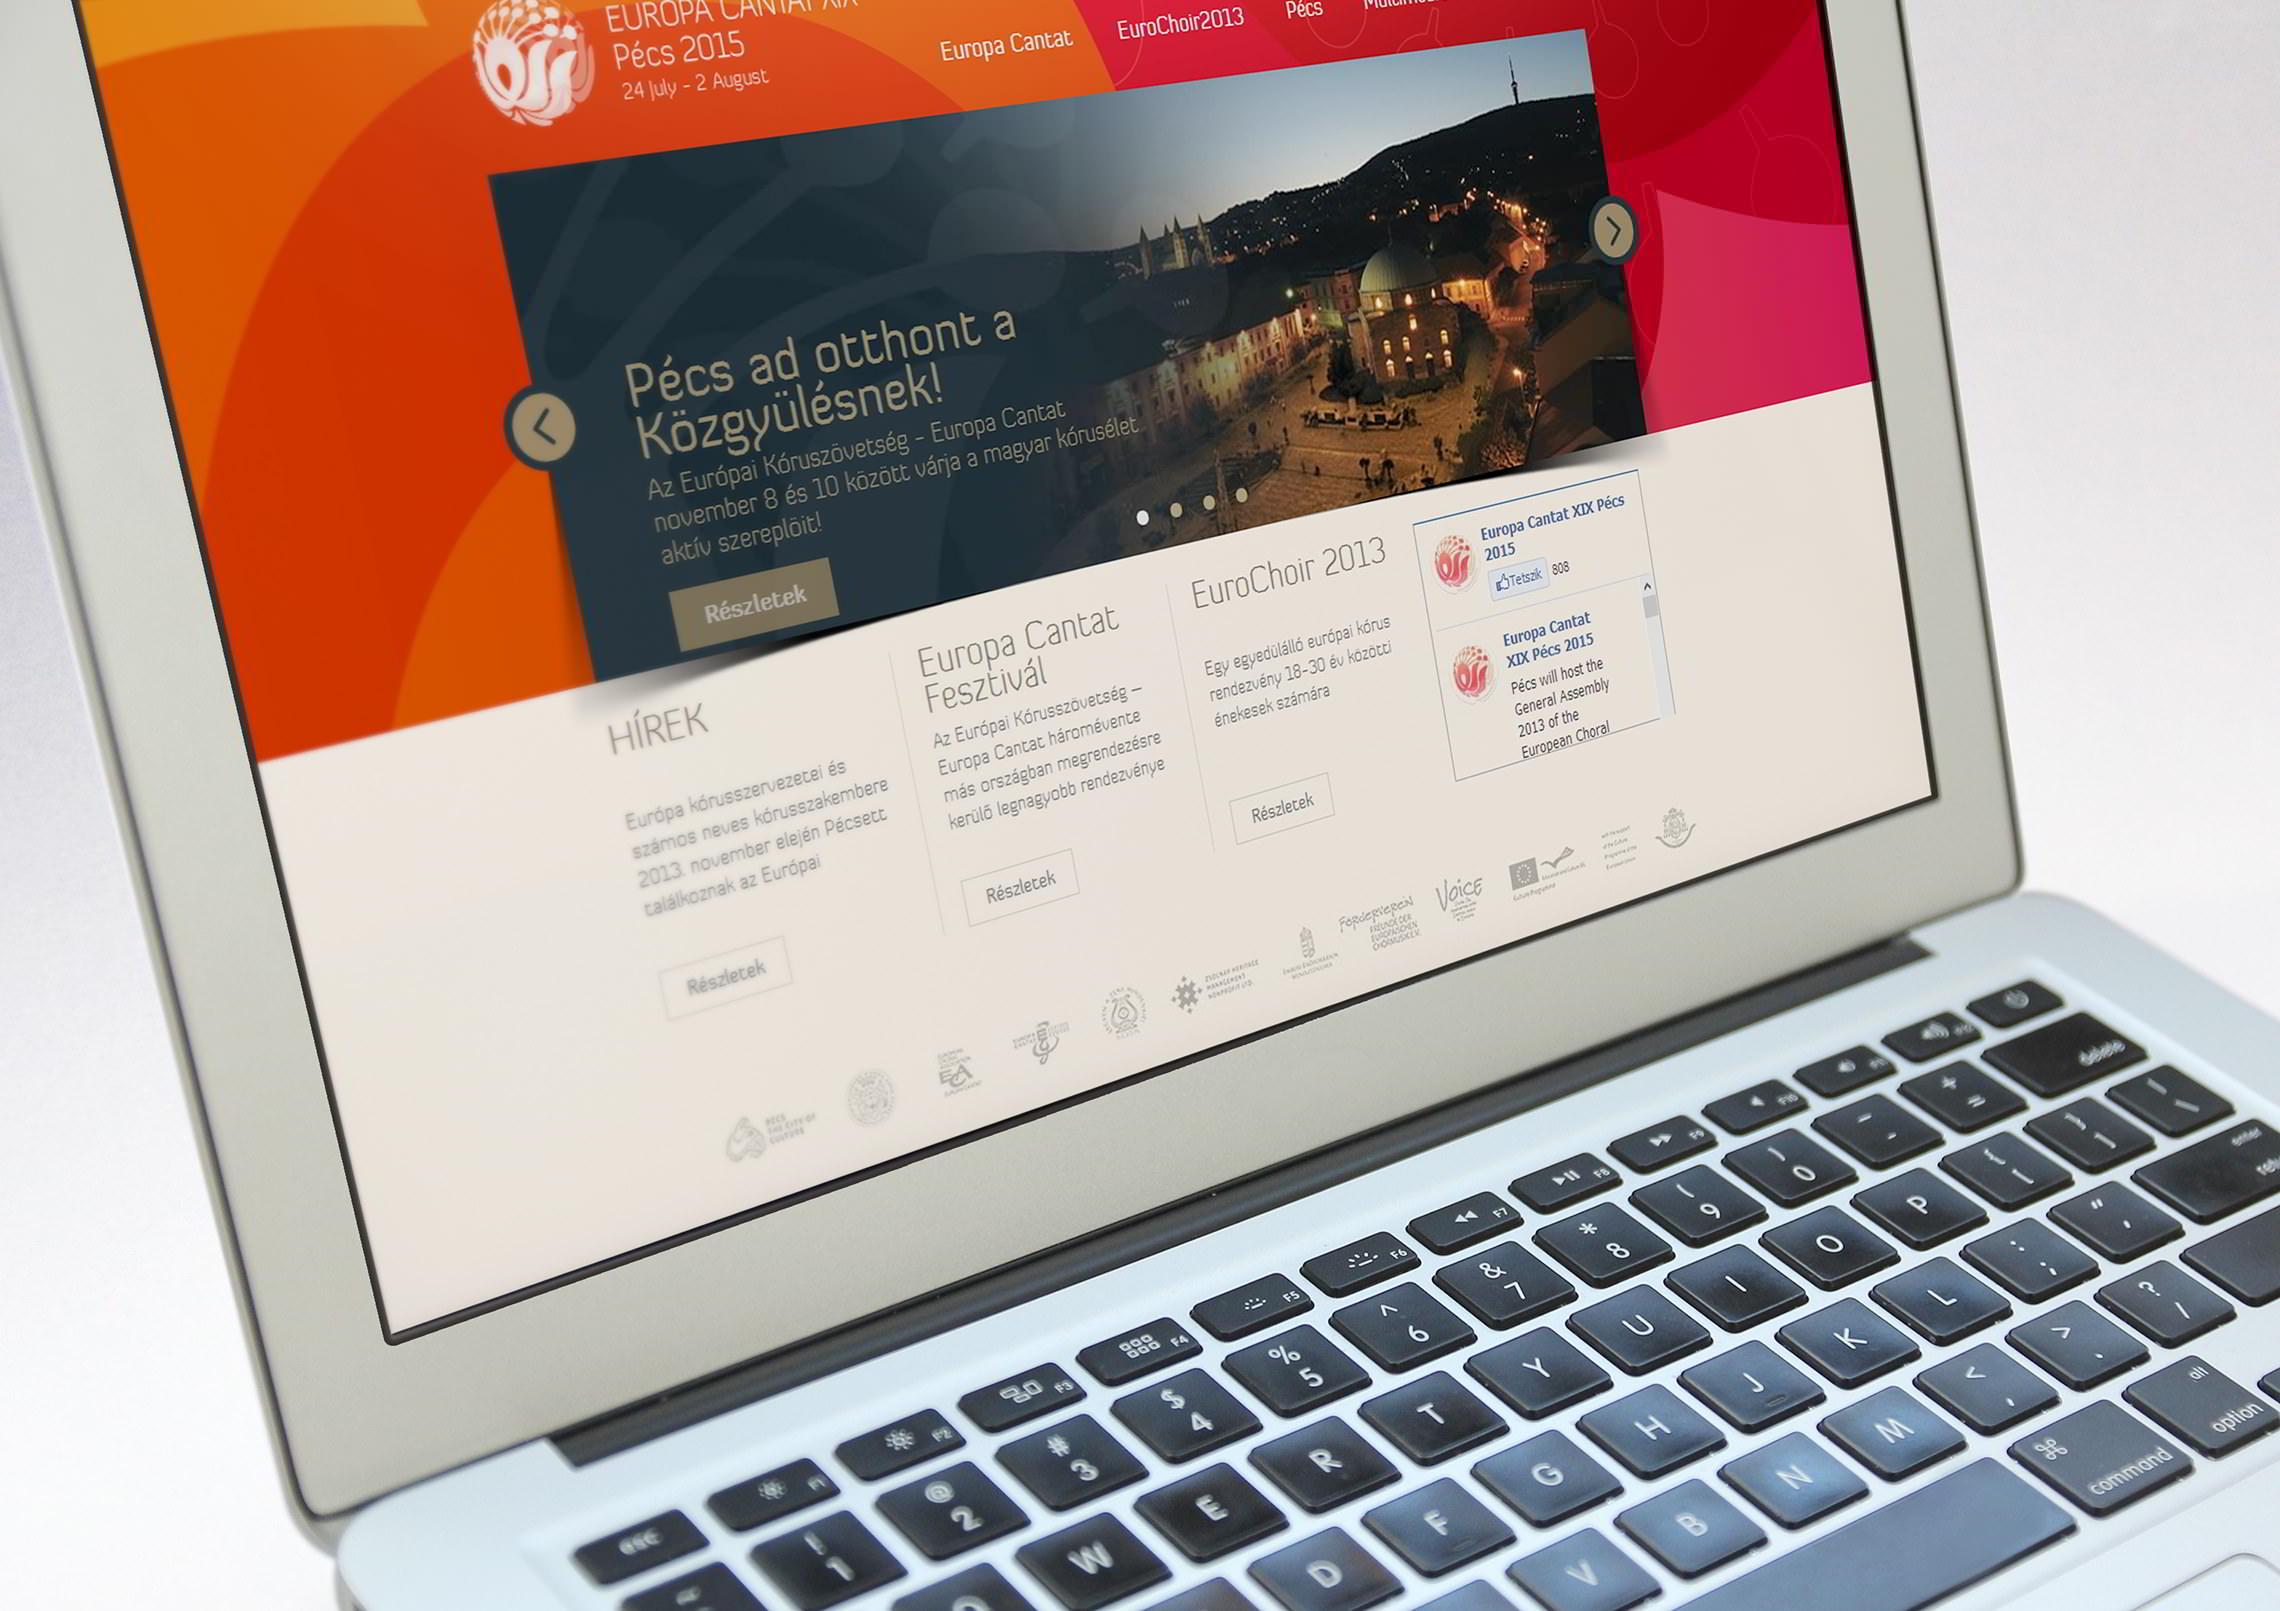 Webdesign - Europa Cantat 2015